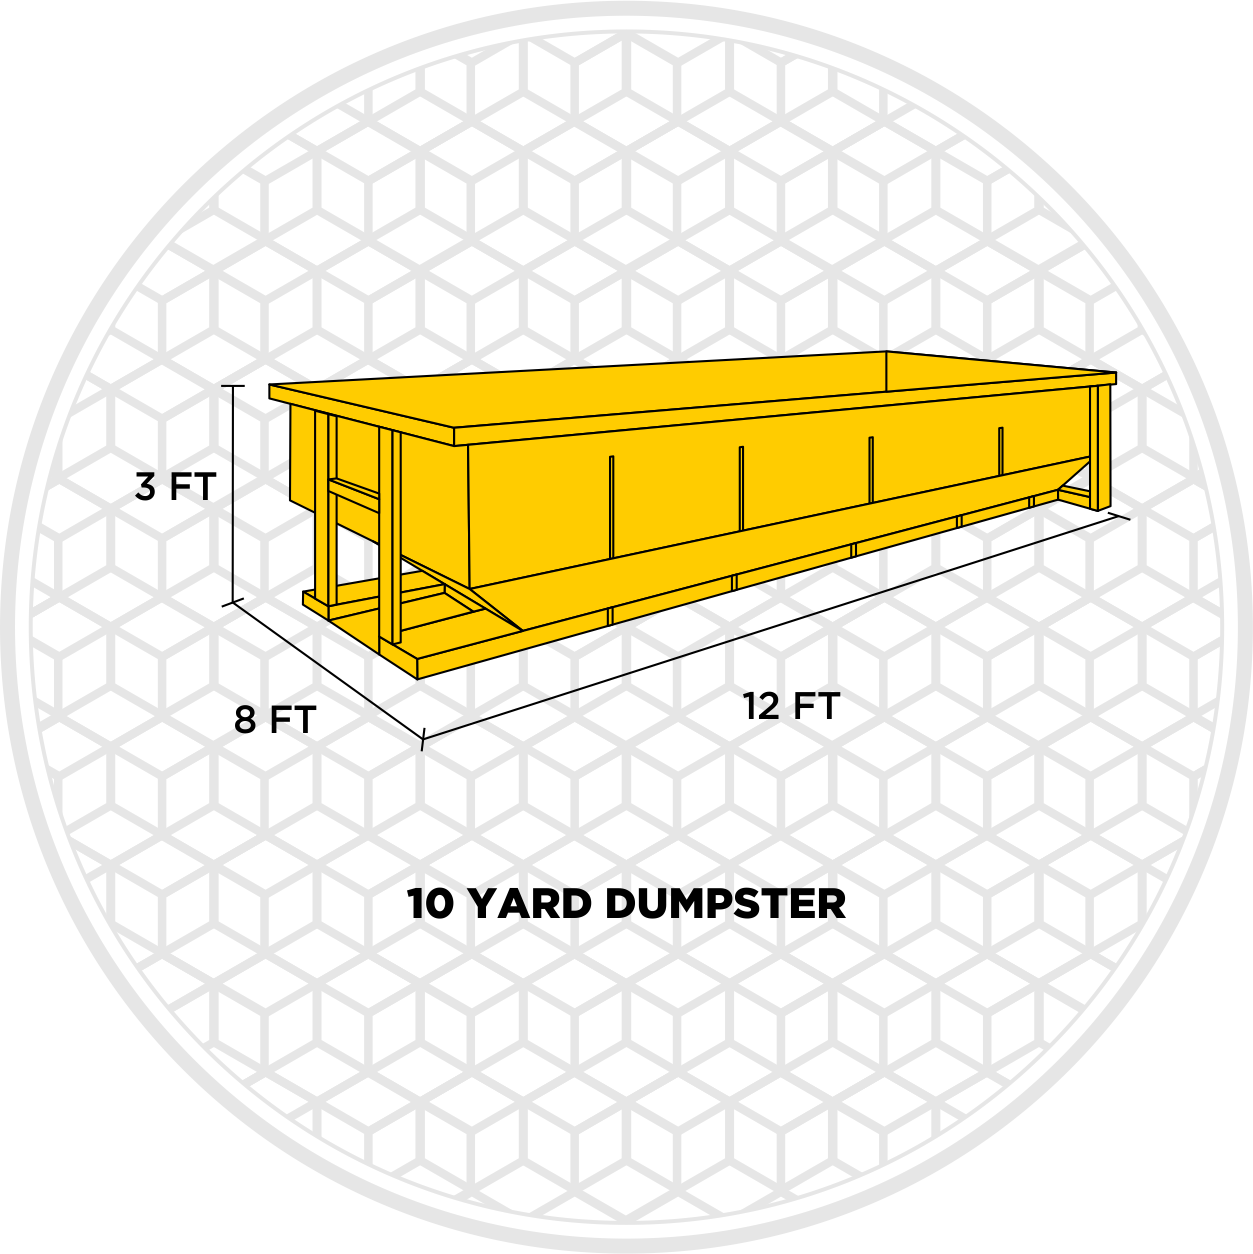 10 yard dumpster dimensions